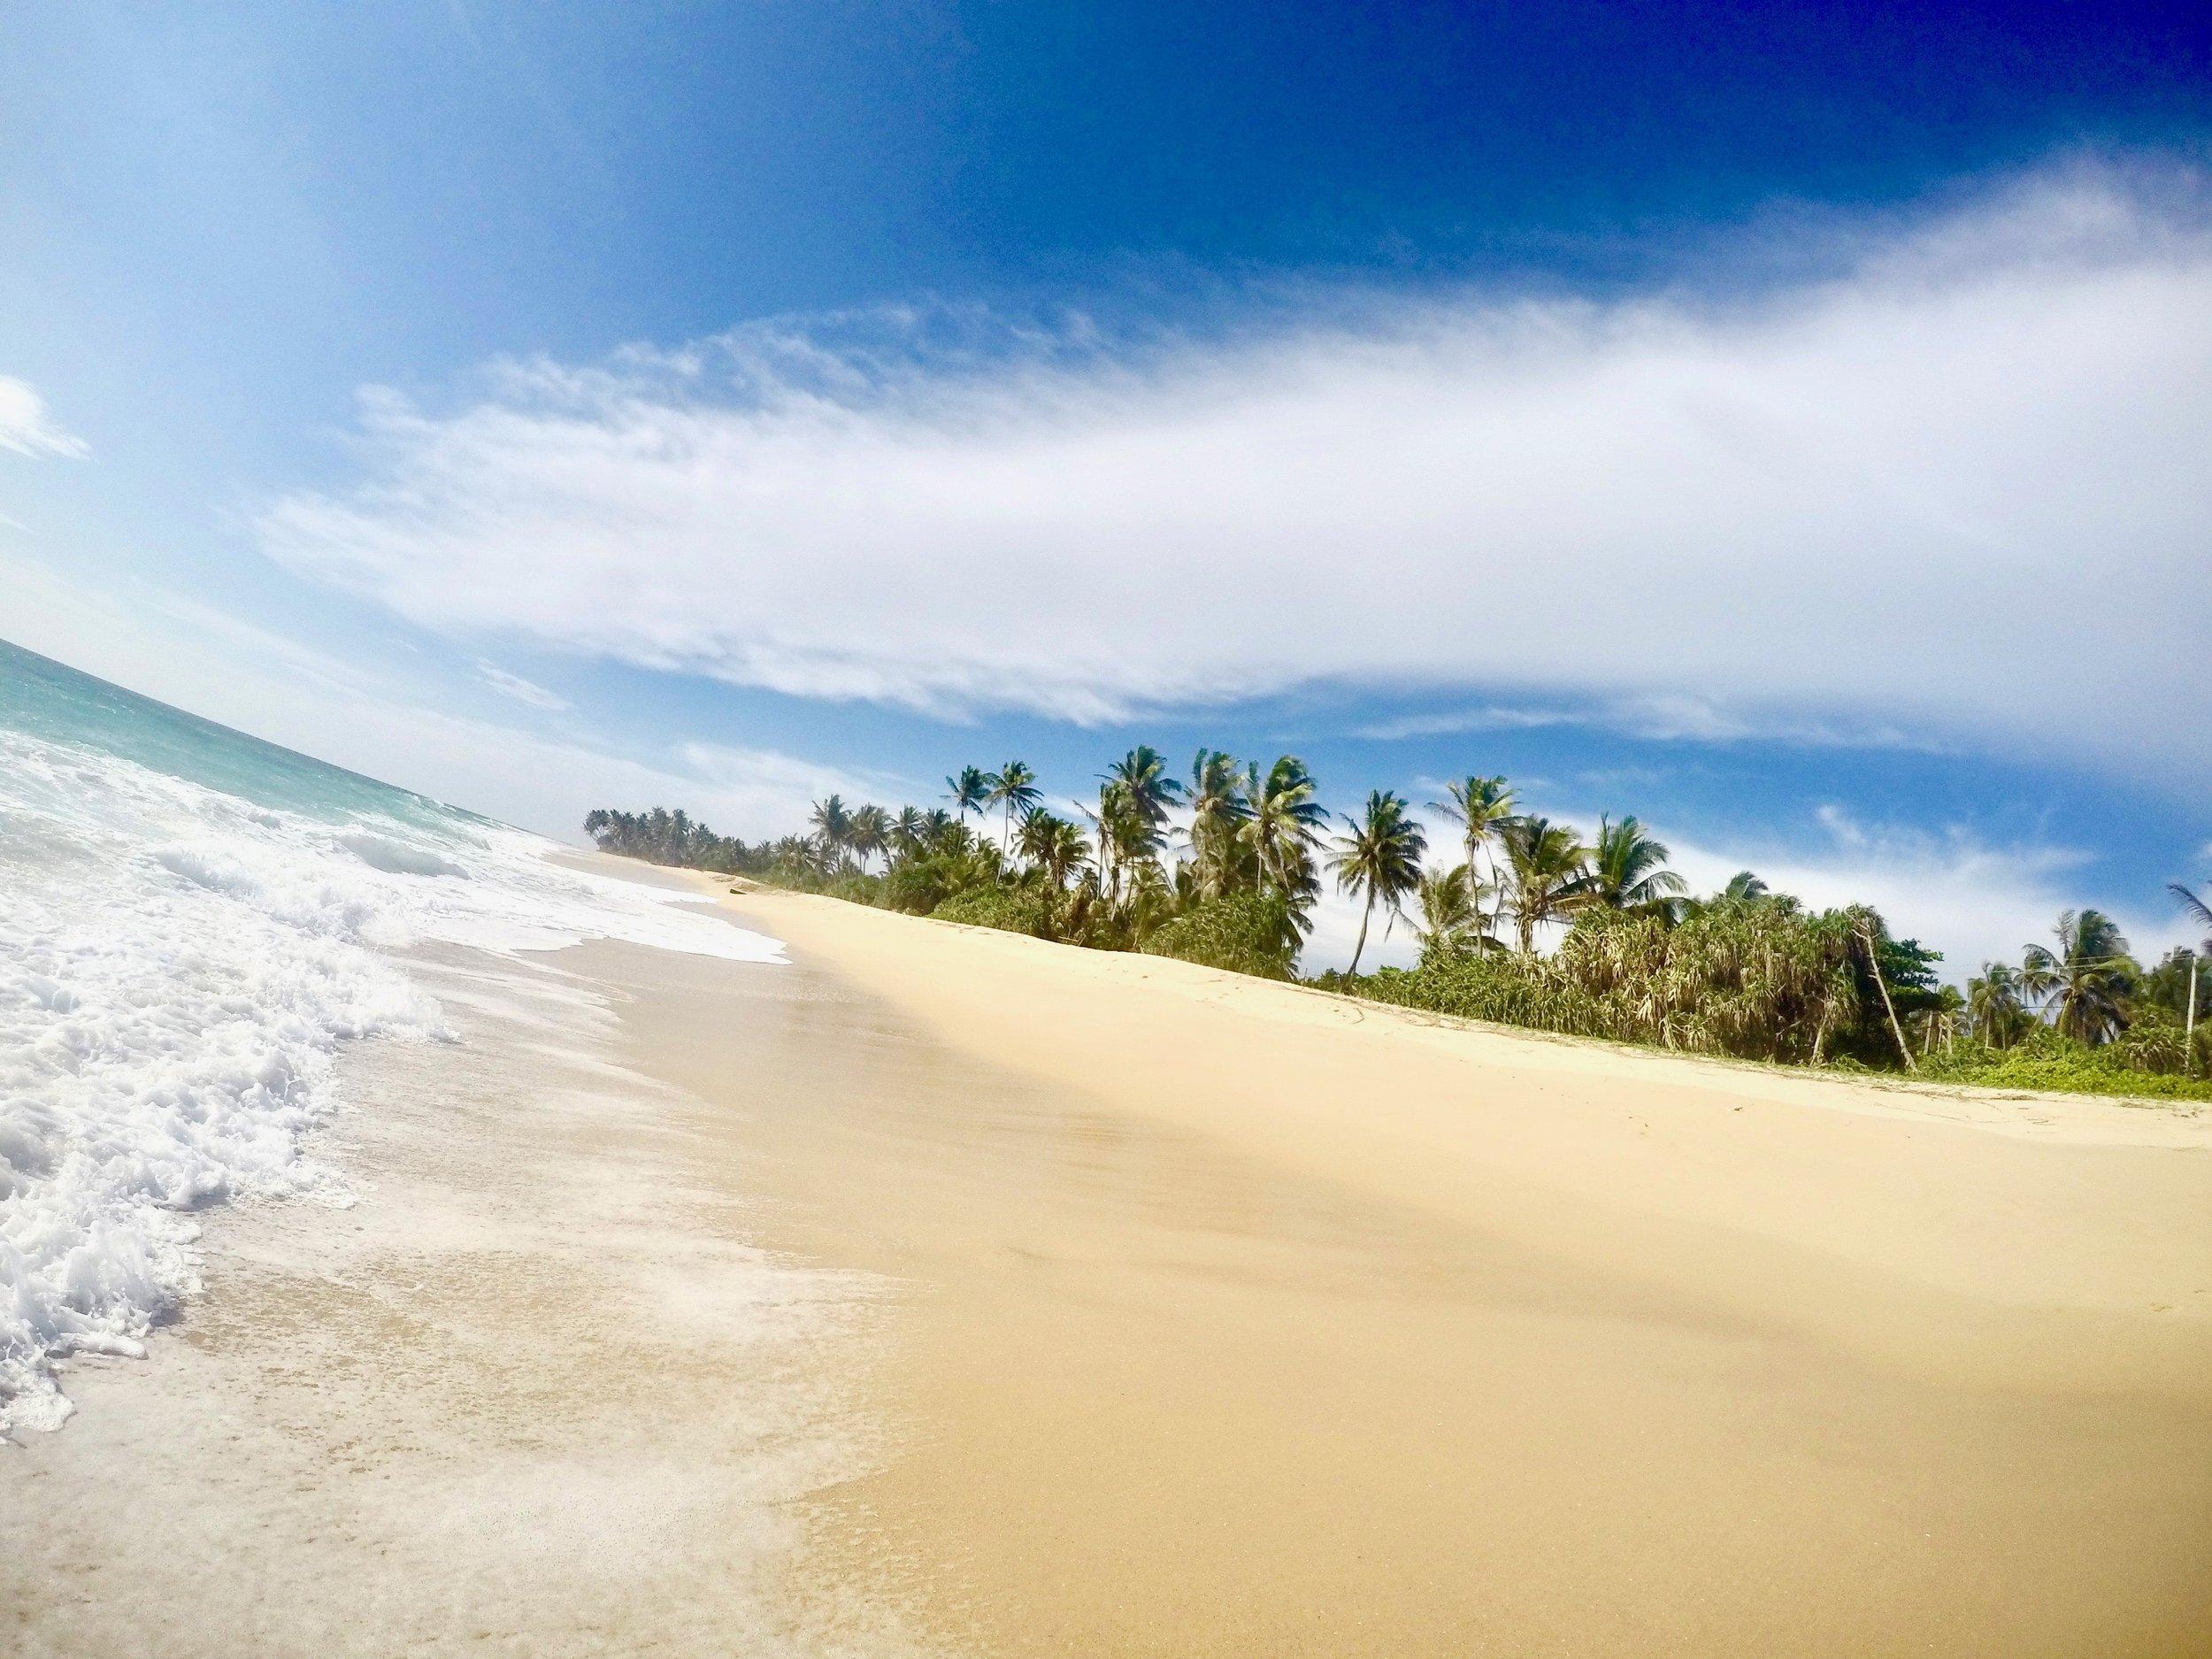 Hikkaduwa is another one of our beautiful Sri Lanka beaches.